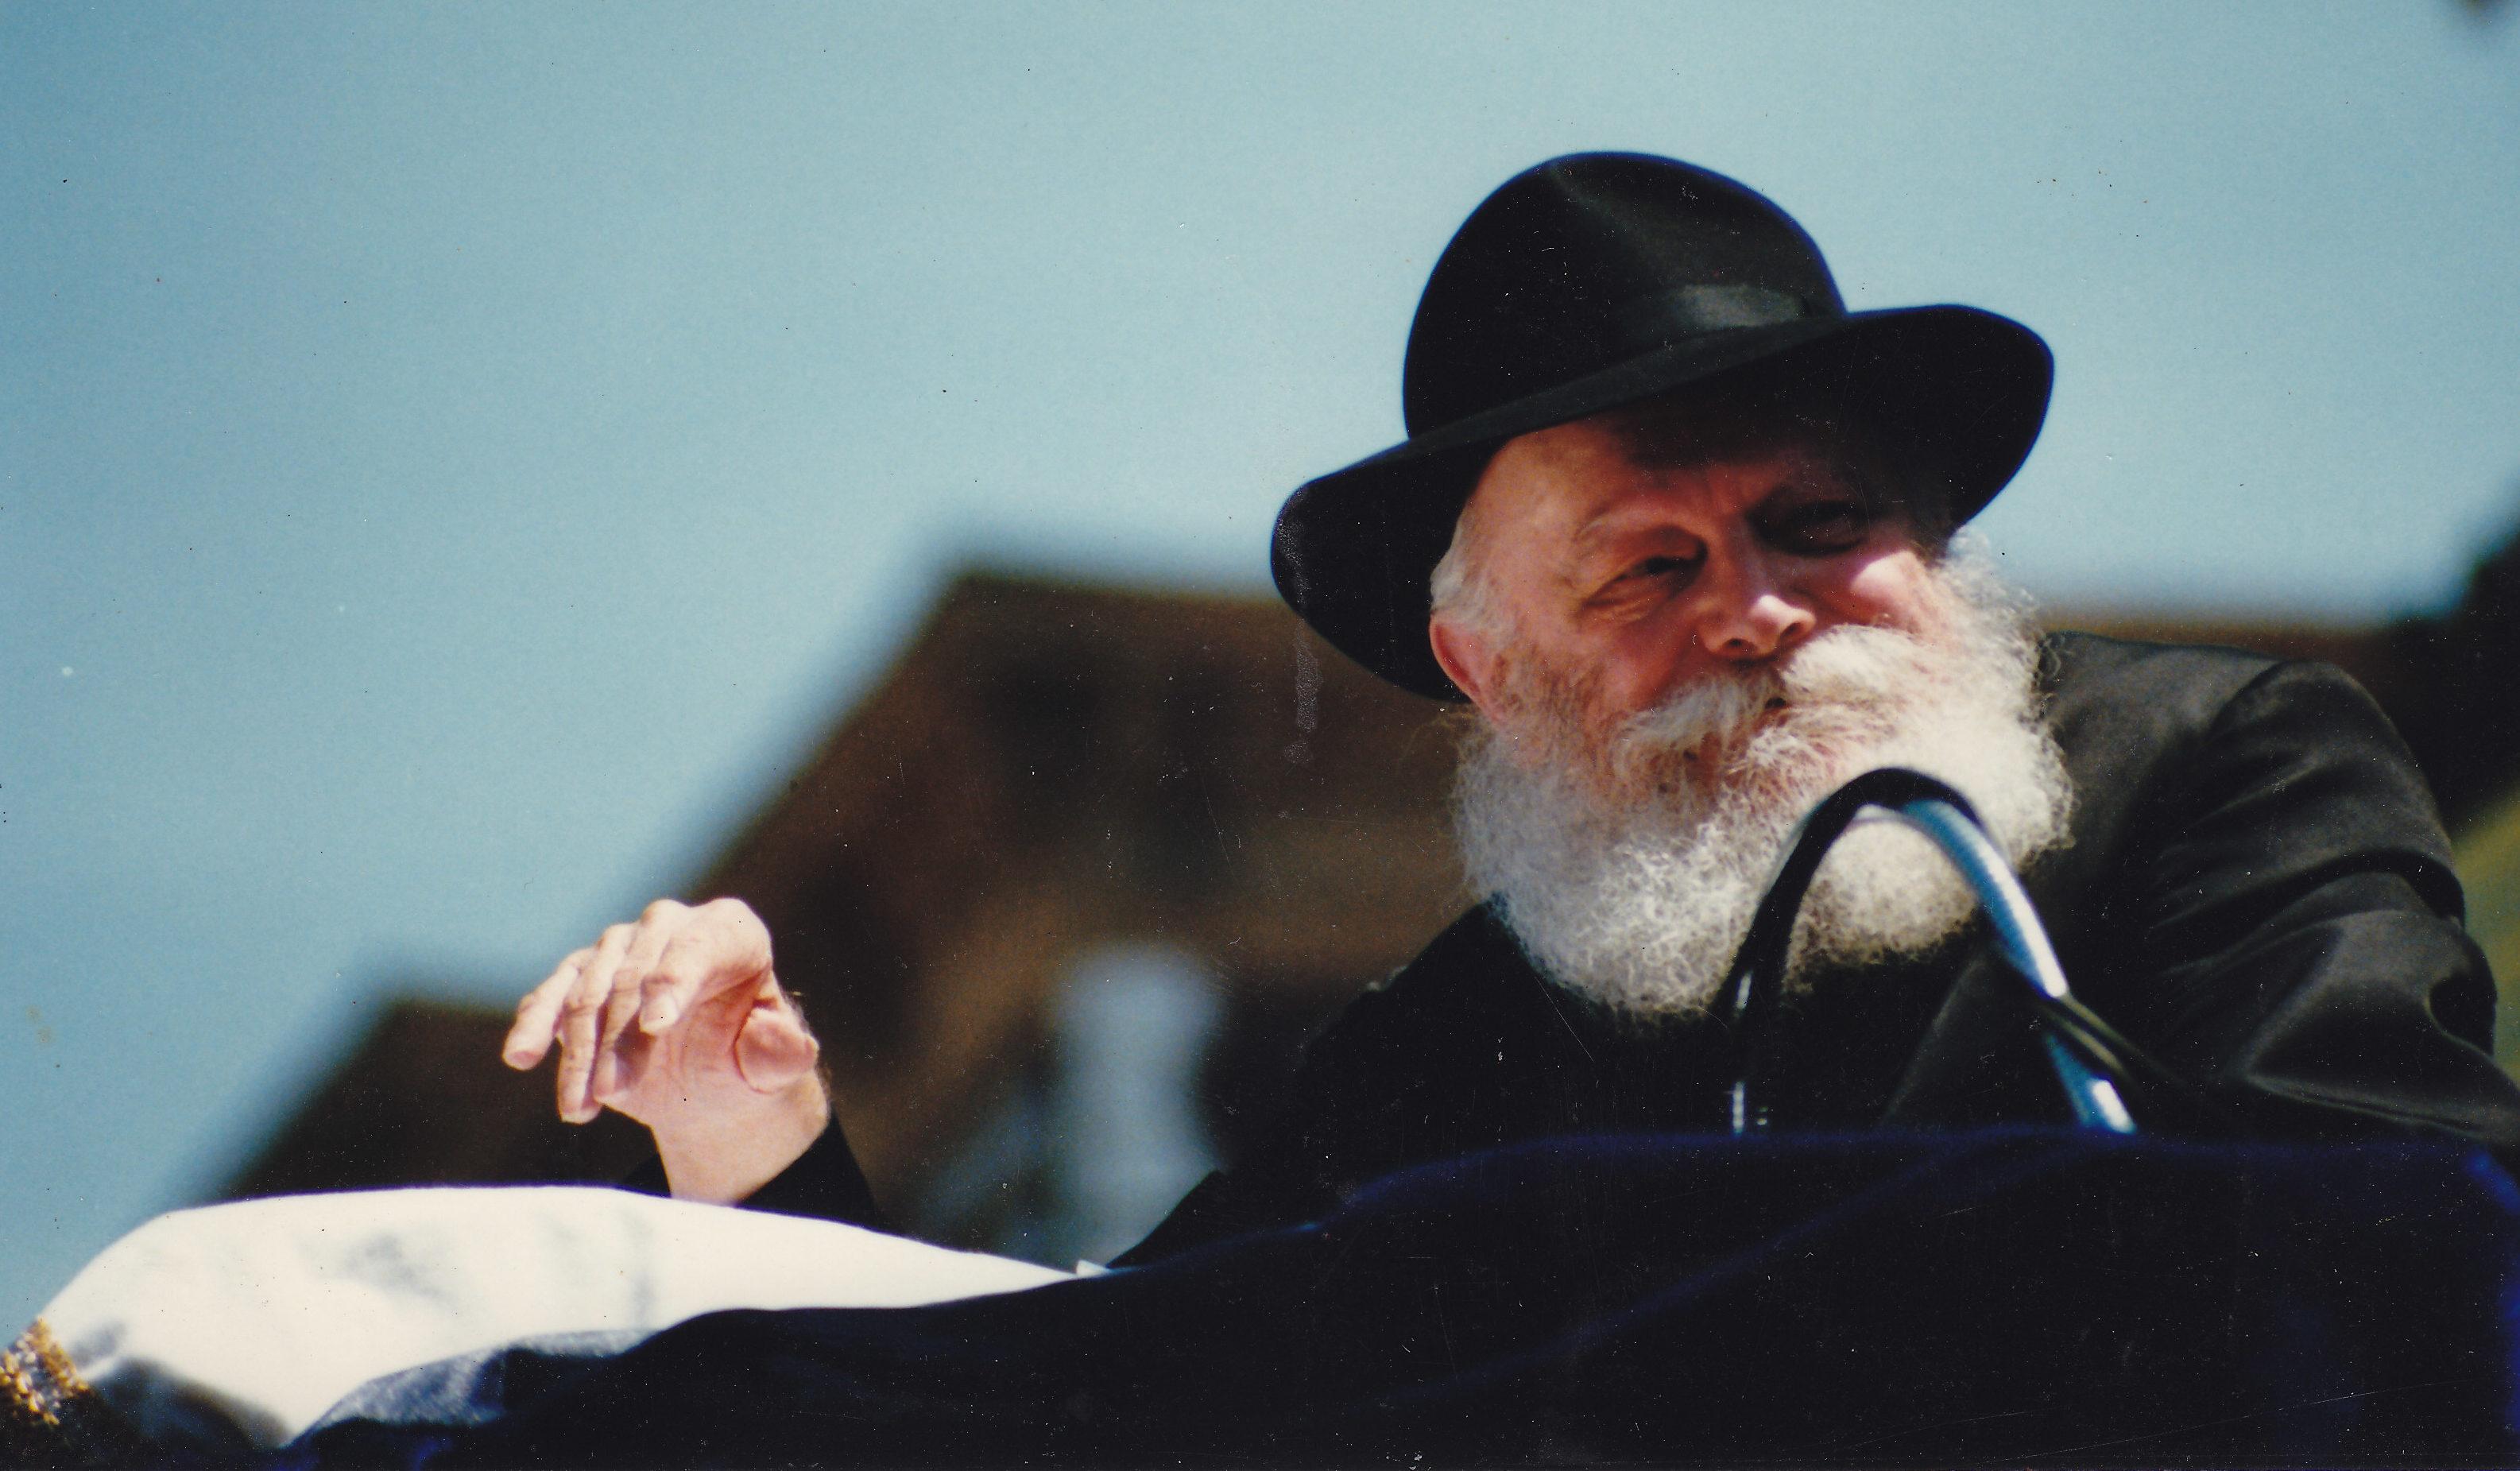 The late Chabad rebbe, Menachem Mendel Schneerson, in Brooklyn, May 1987 (Photo/Wikimedia CC BY 3.0)